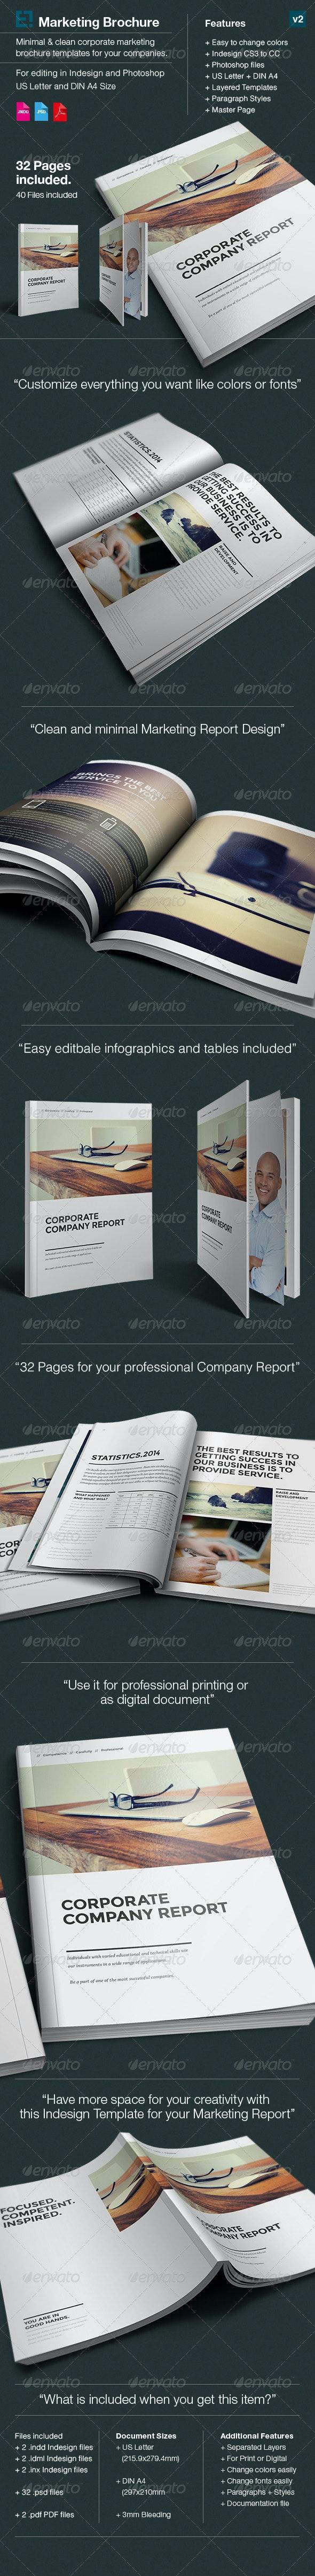 Design Marketing Brochure / A4 and US Letter v1  - Corporate Brochures